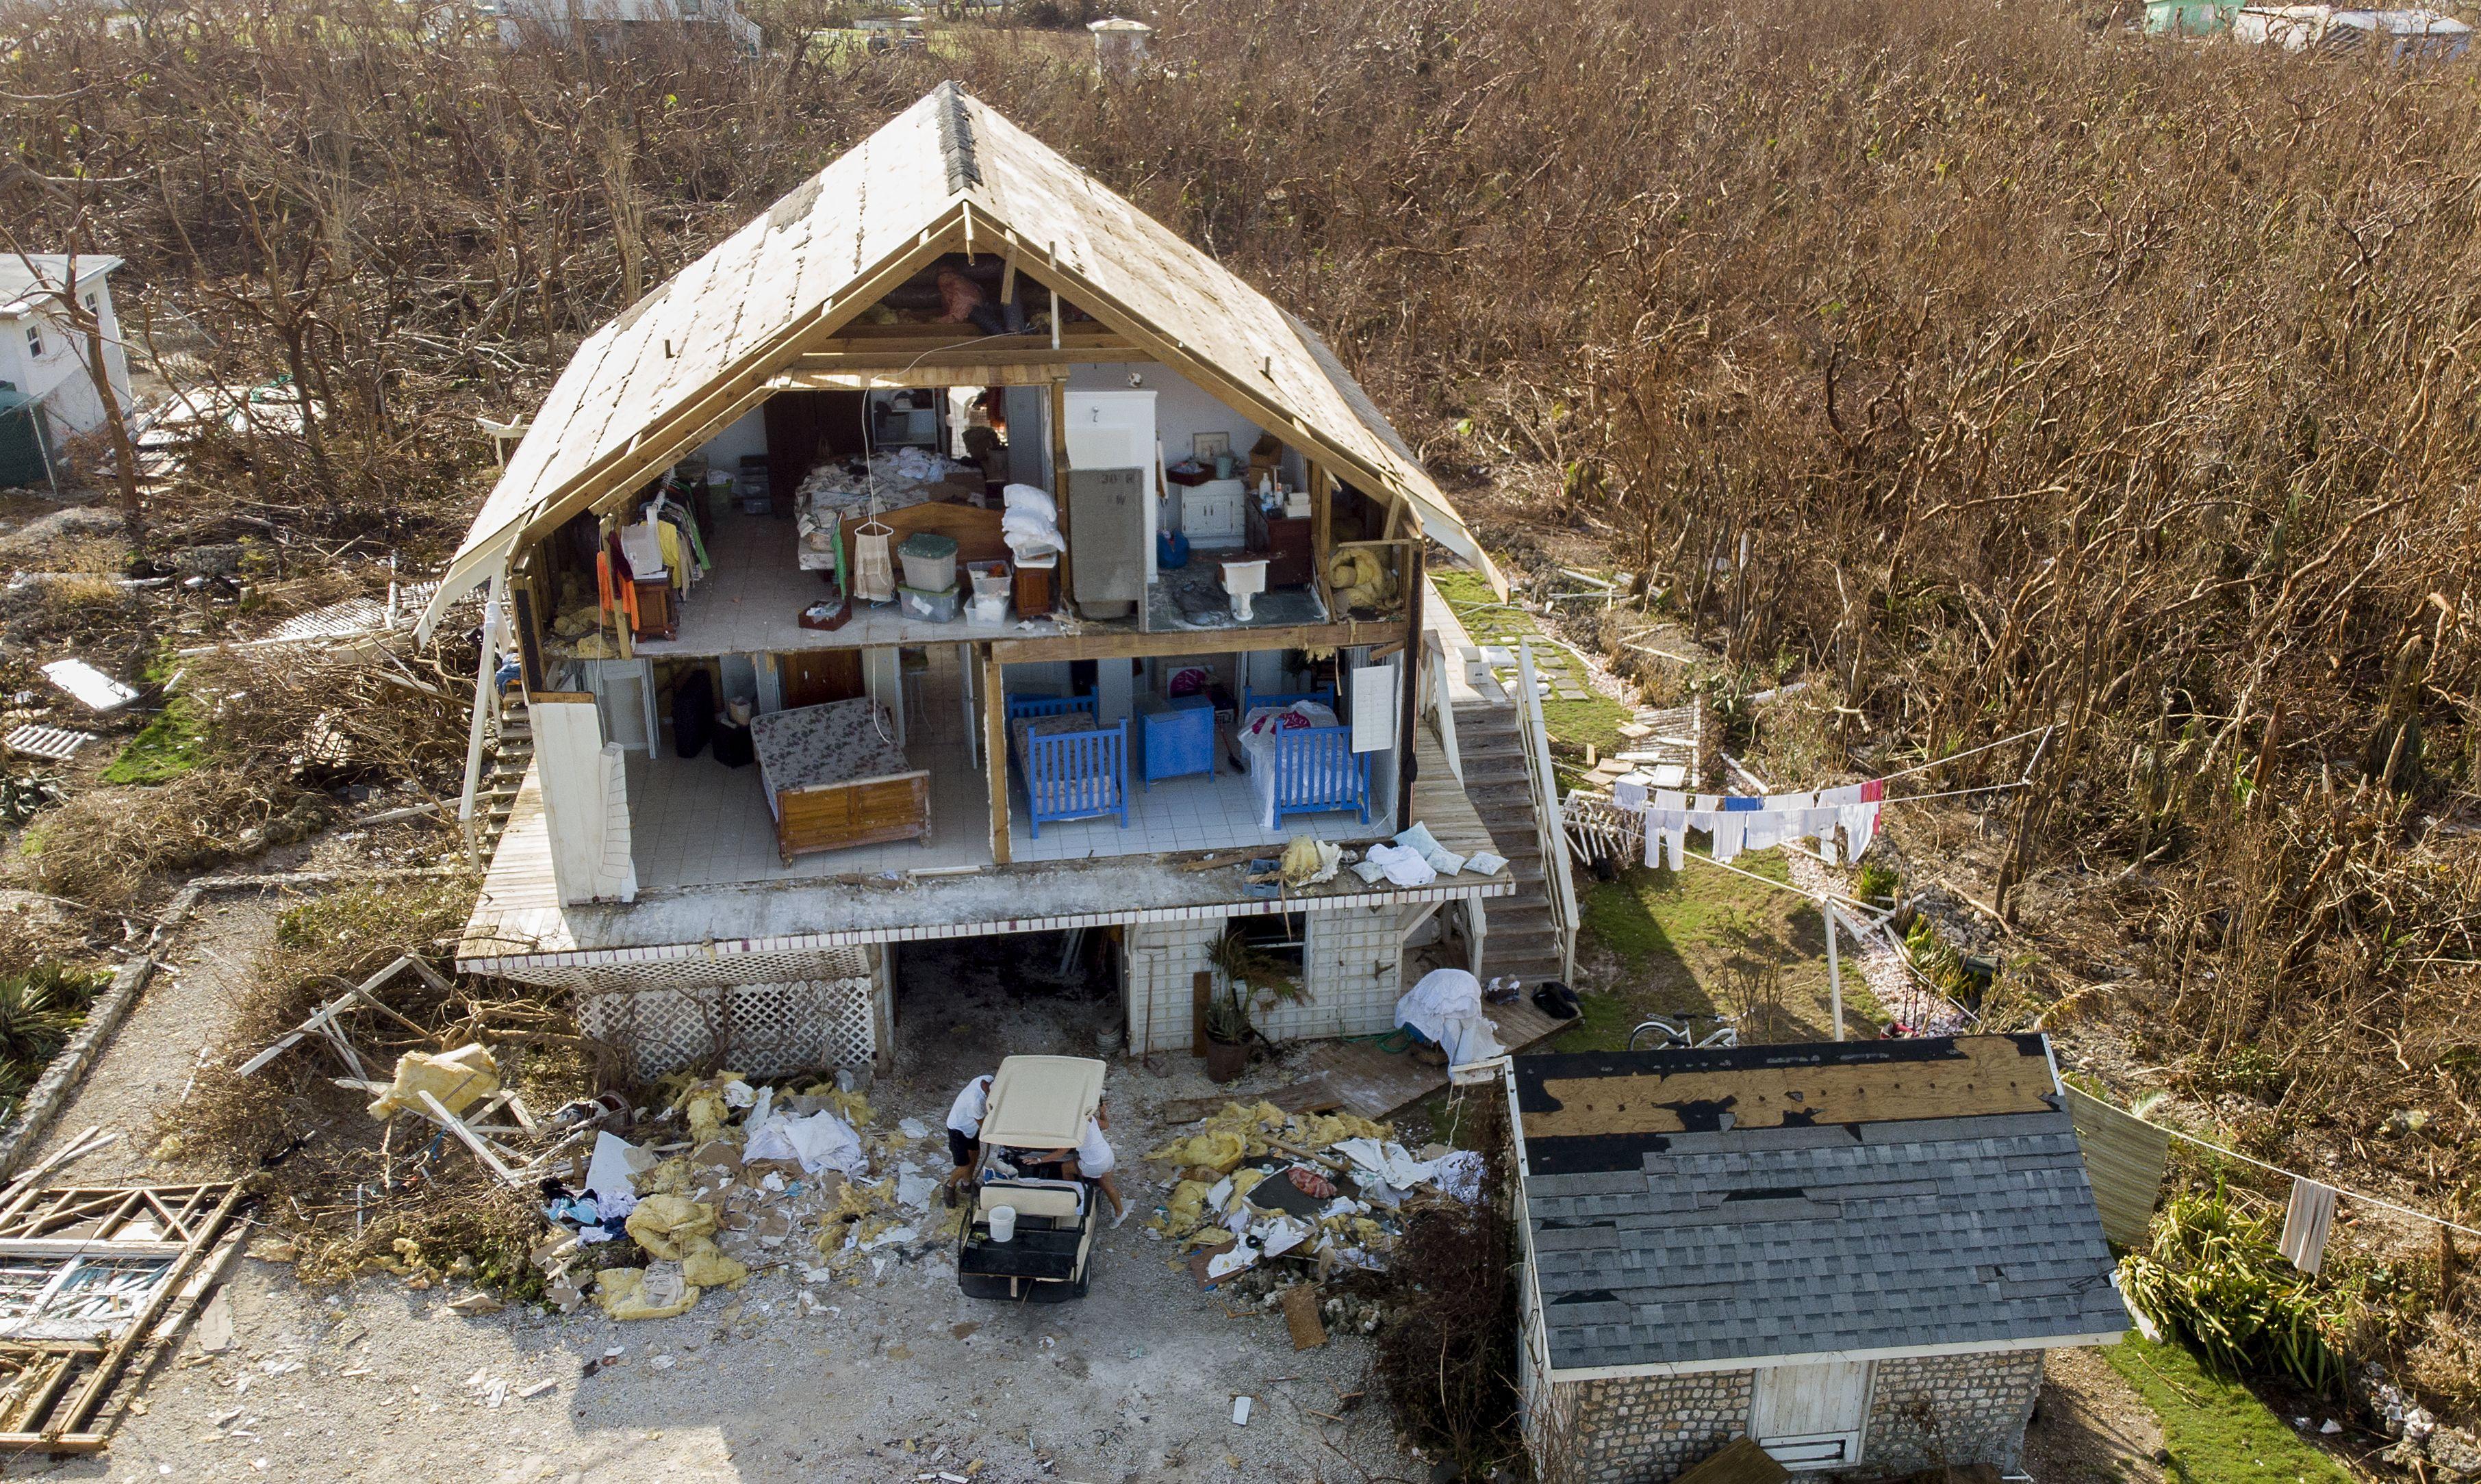 A home damaged after hurricane Dorian devastated Elbow Key Island on September 8